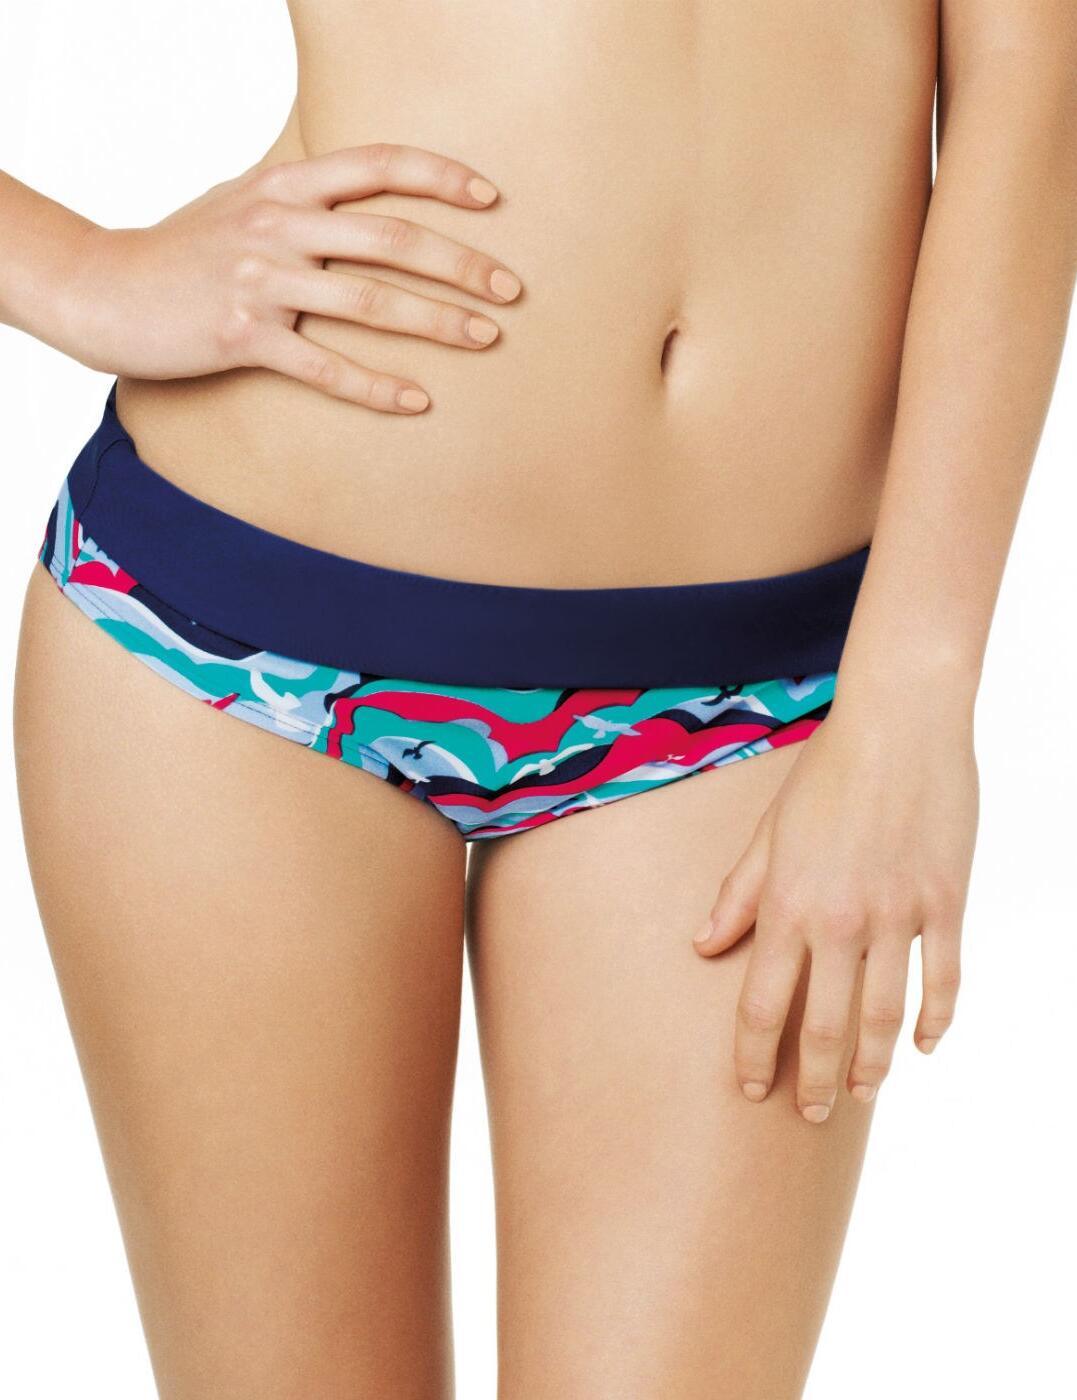 CW0017 Cleo Tilly Fold Bikini Brief - CW0017 Fold Brief